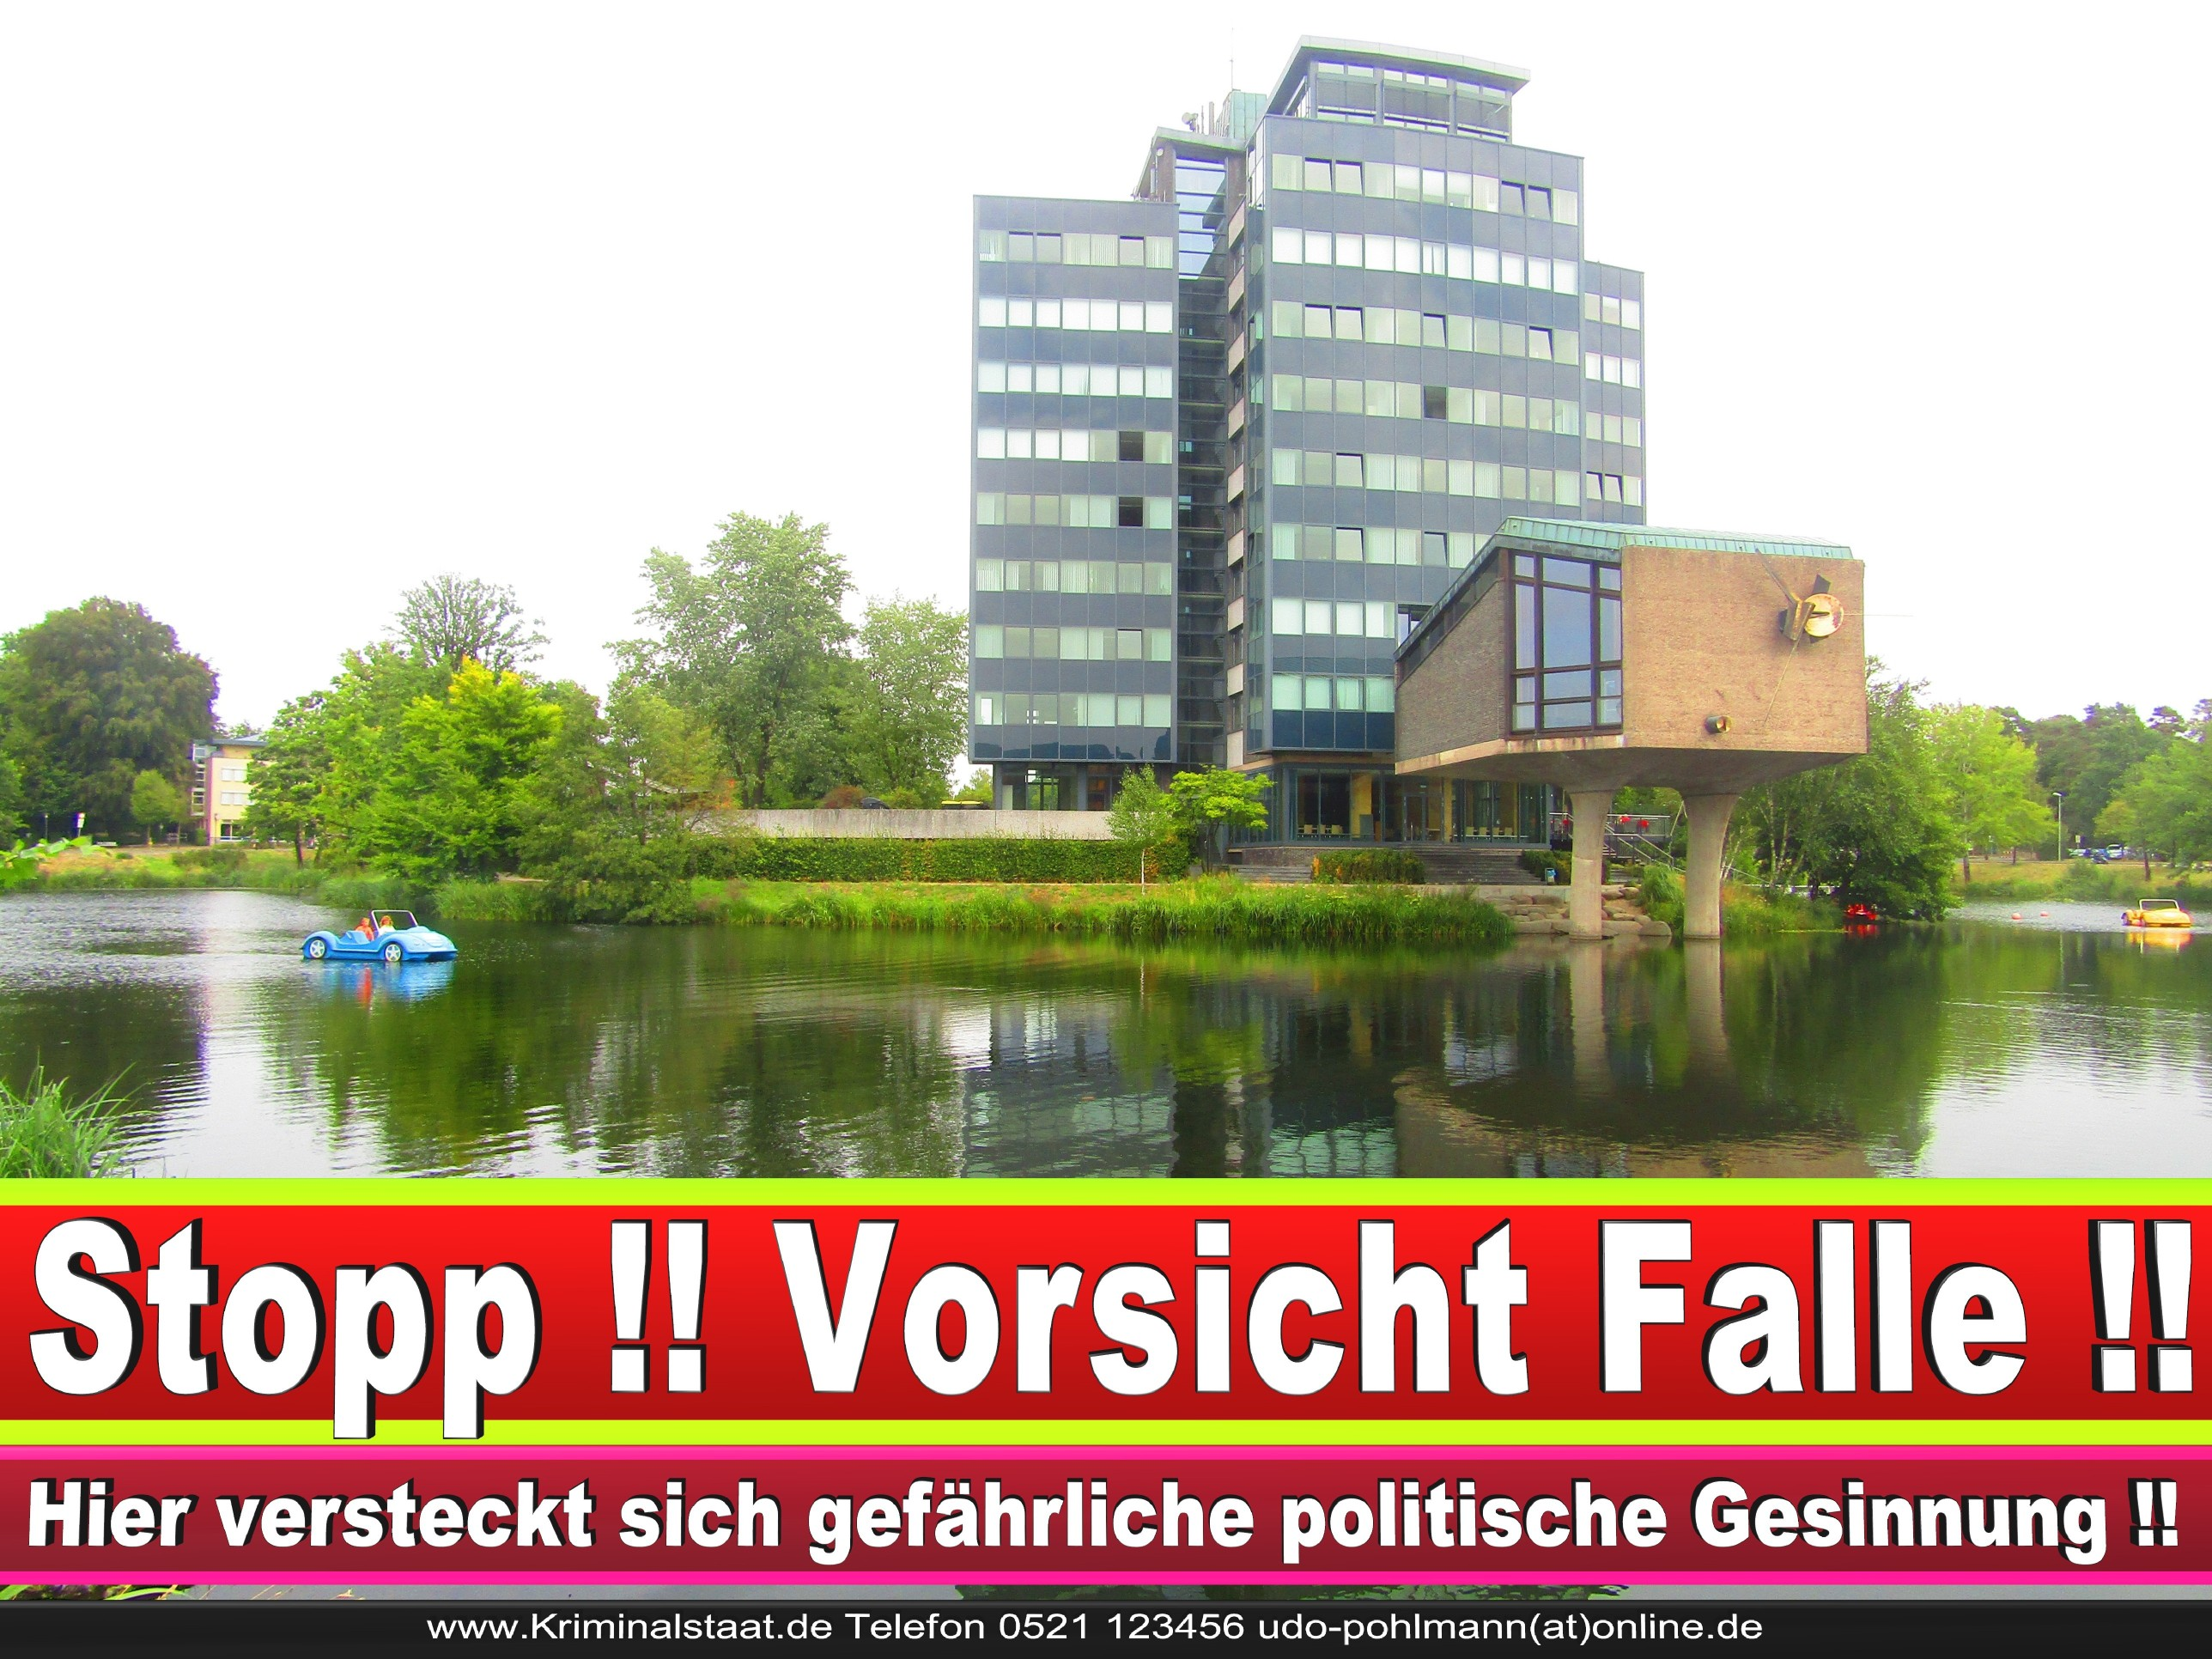 SENNESTADTVEREIN CDU BIELEFELD 7 LANDTAGSWAHL BUNDESTAGSWAHL BÜRGERMEISTERWAHL